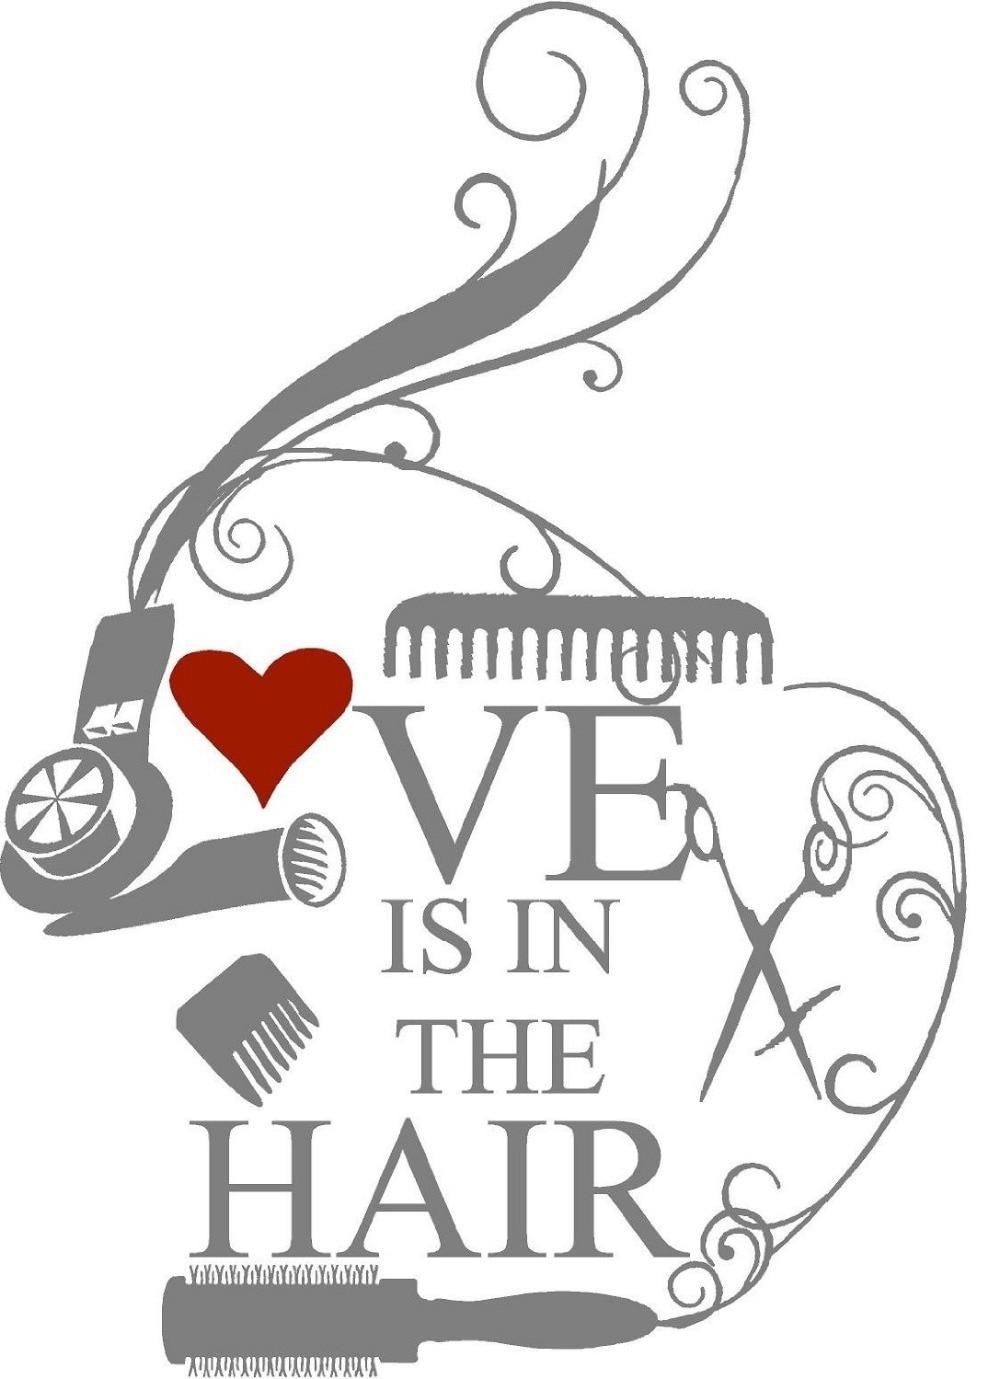 Download Hair Salon Vinyl Wall Decal Barbershop Scissors Hairdryer ...